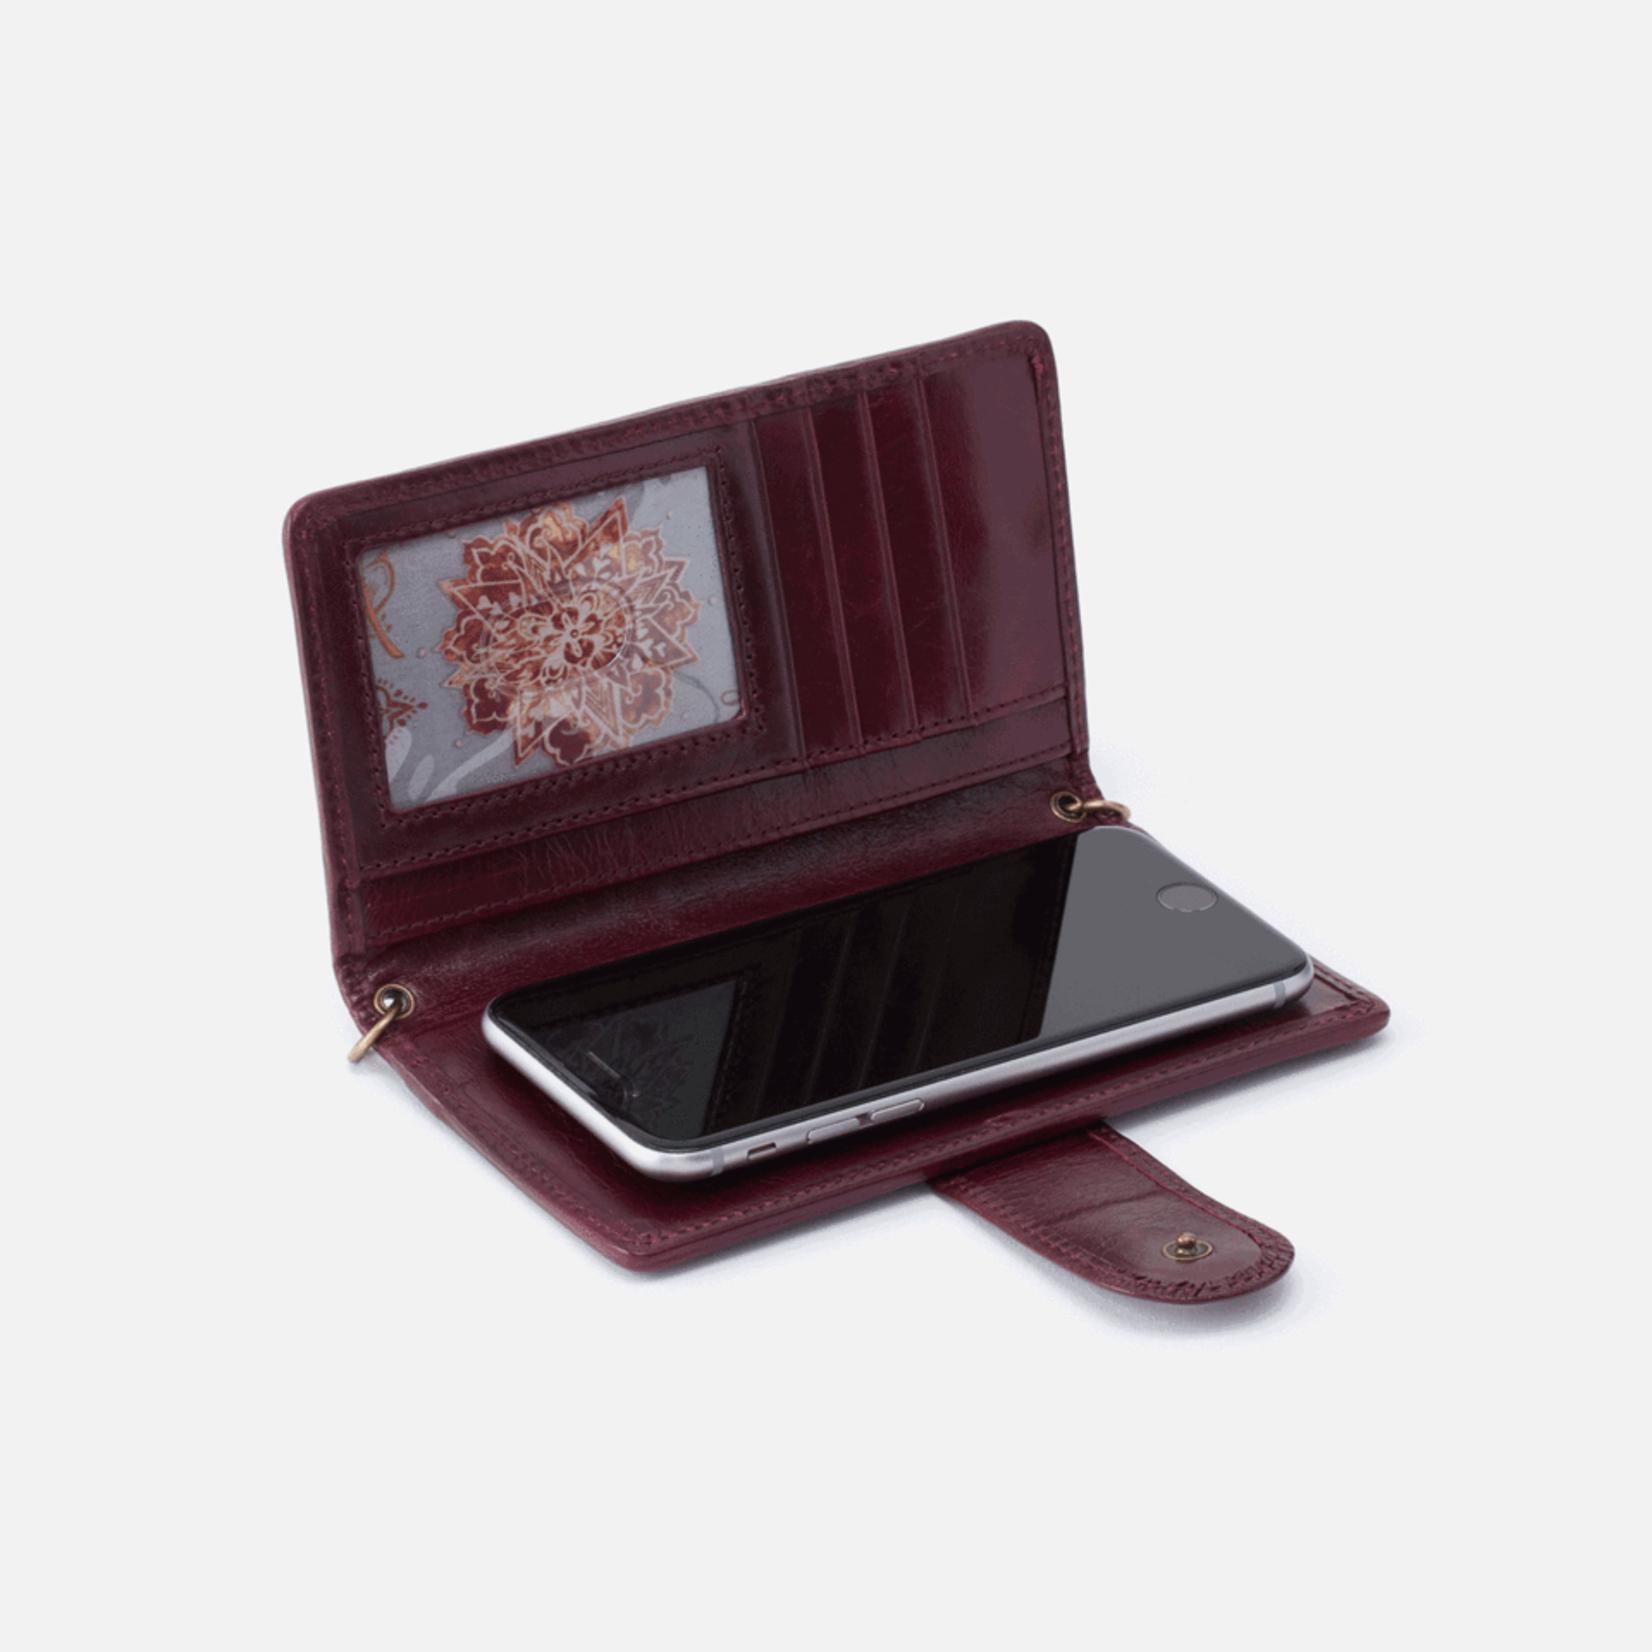 HOBO Apollo Deep Plum Vintage Leather Crossbody/Wallet